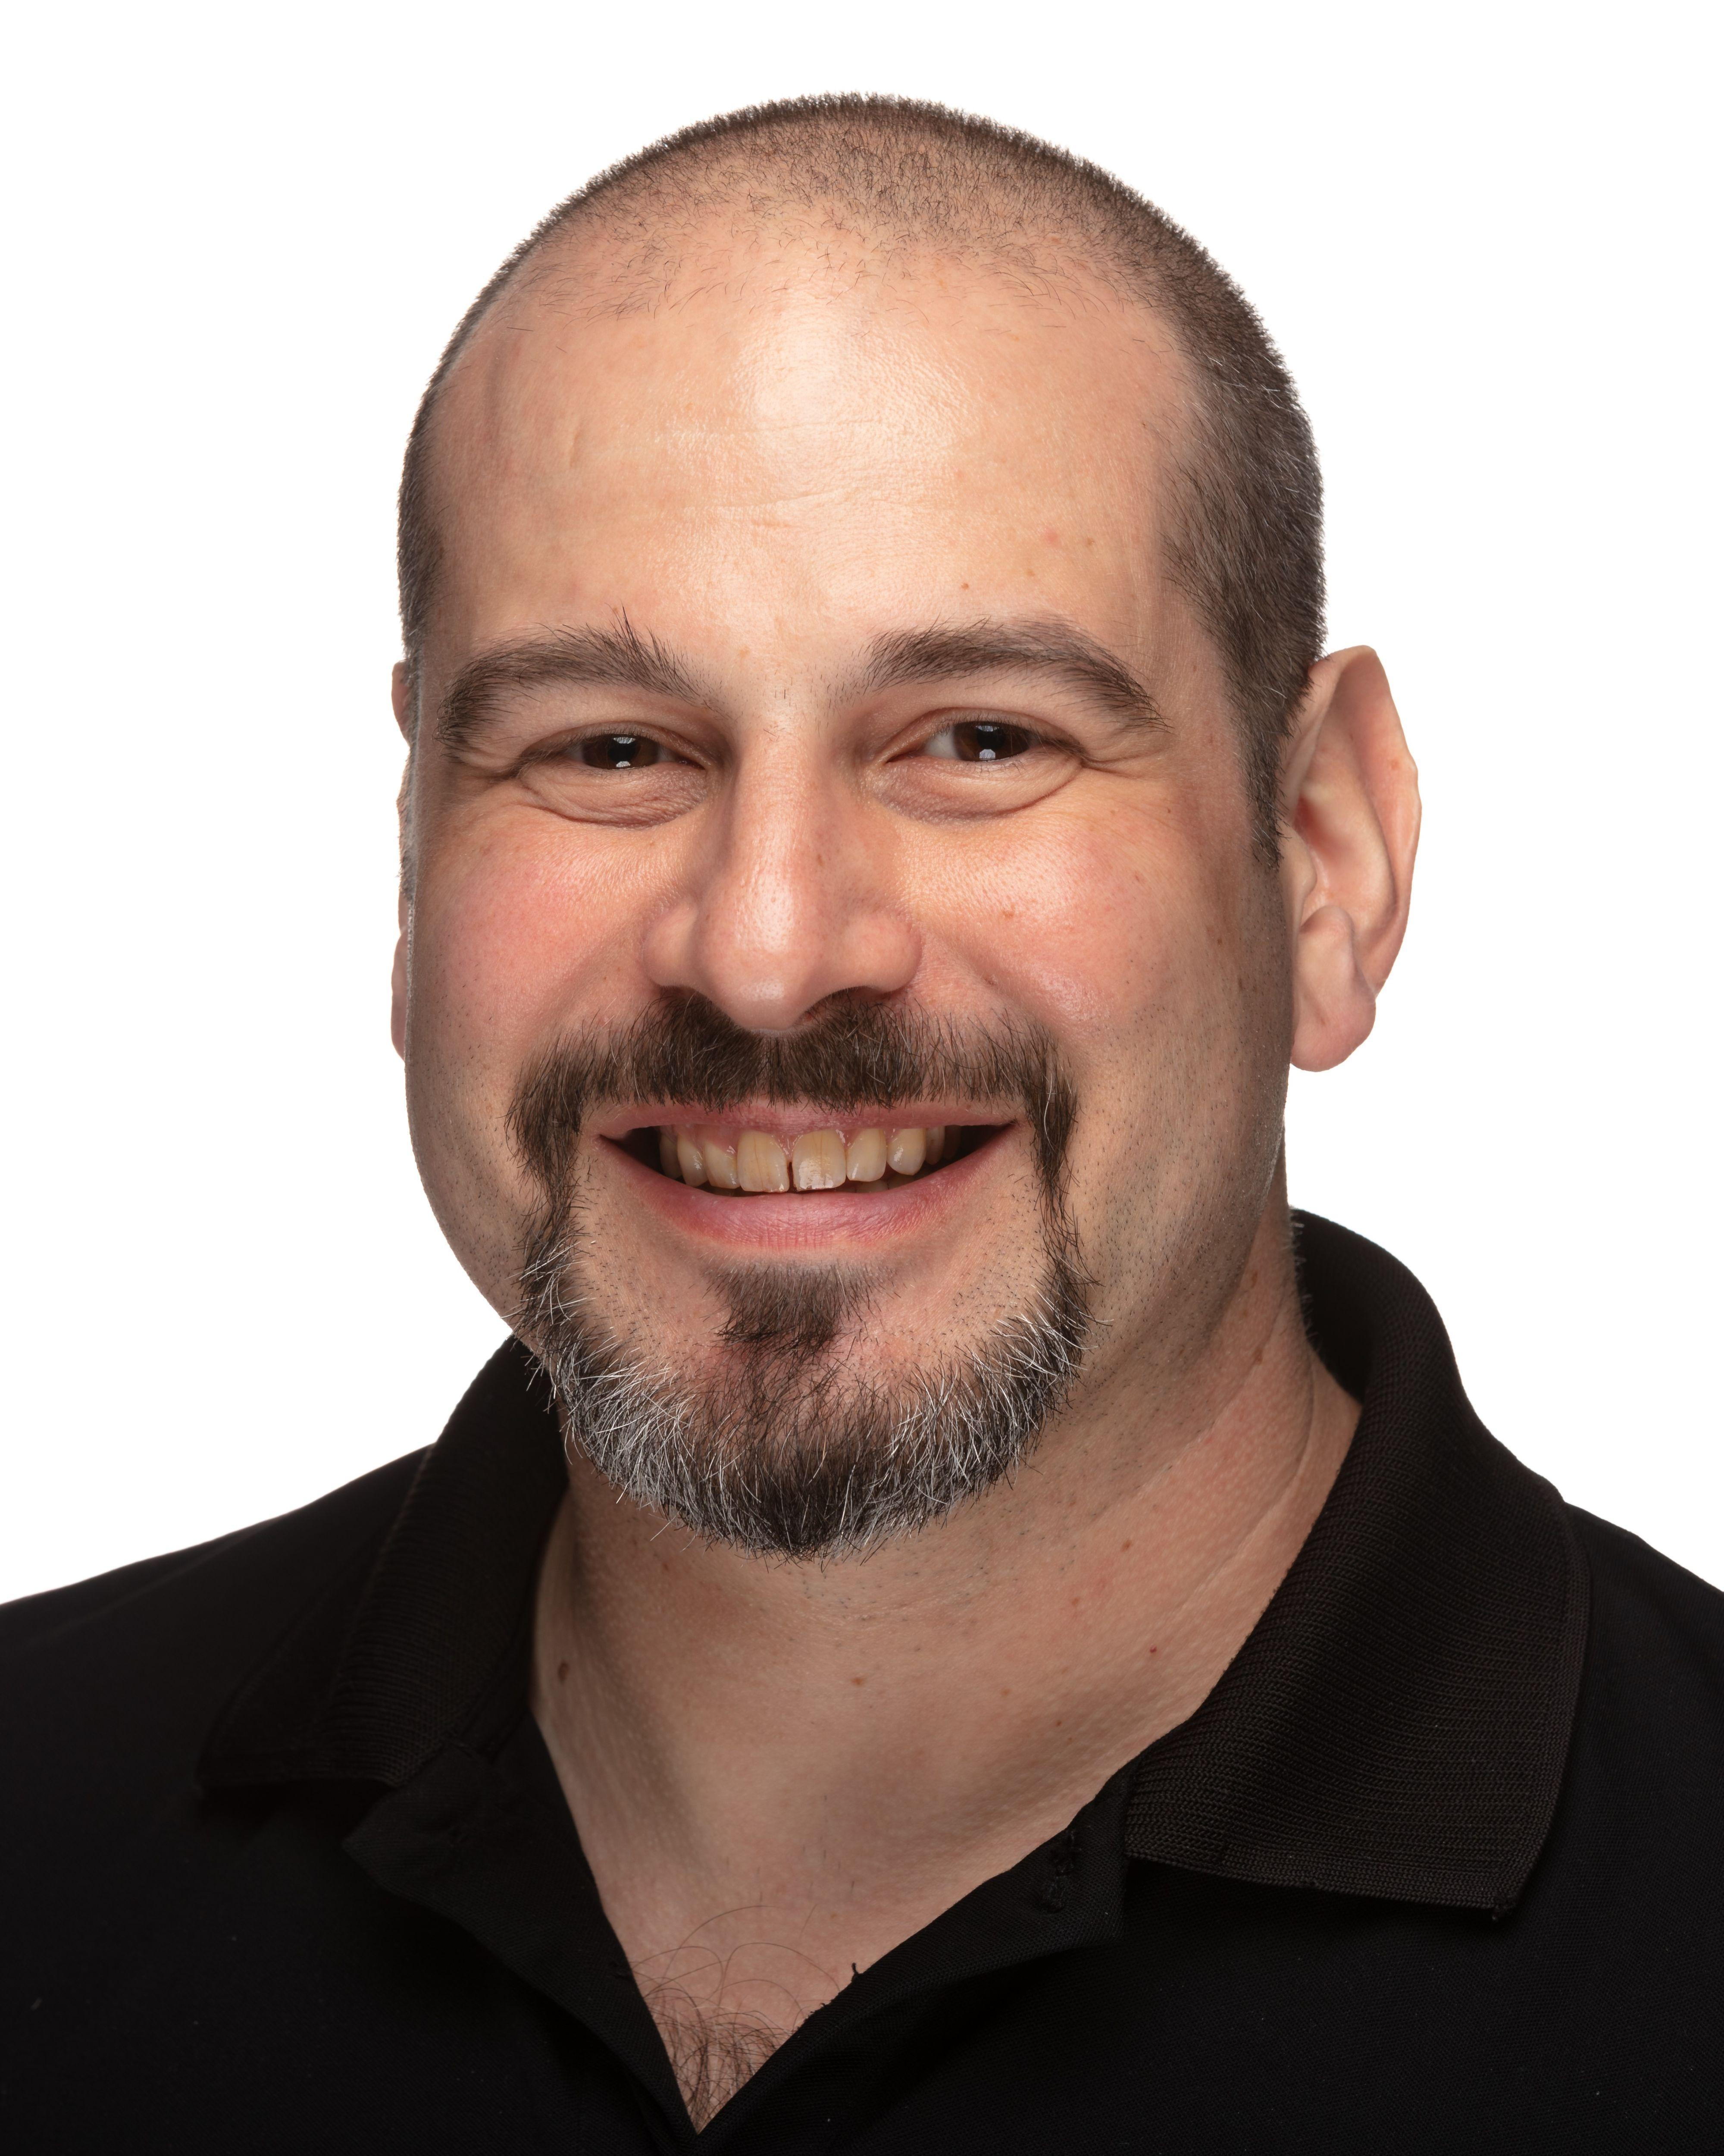 Paul Asadoorian